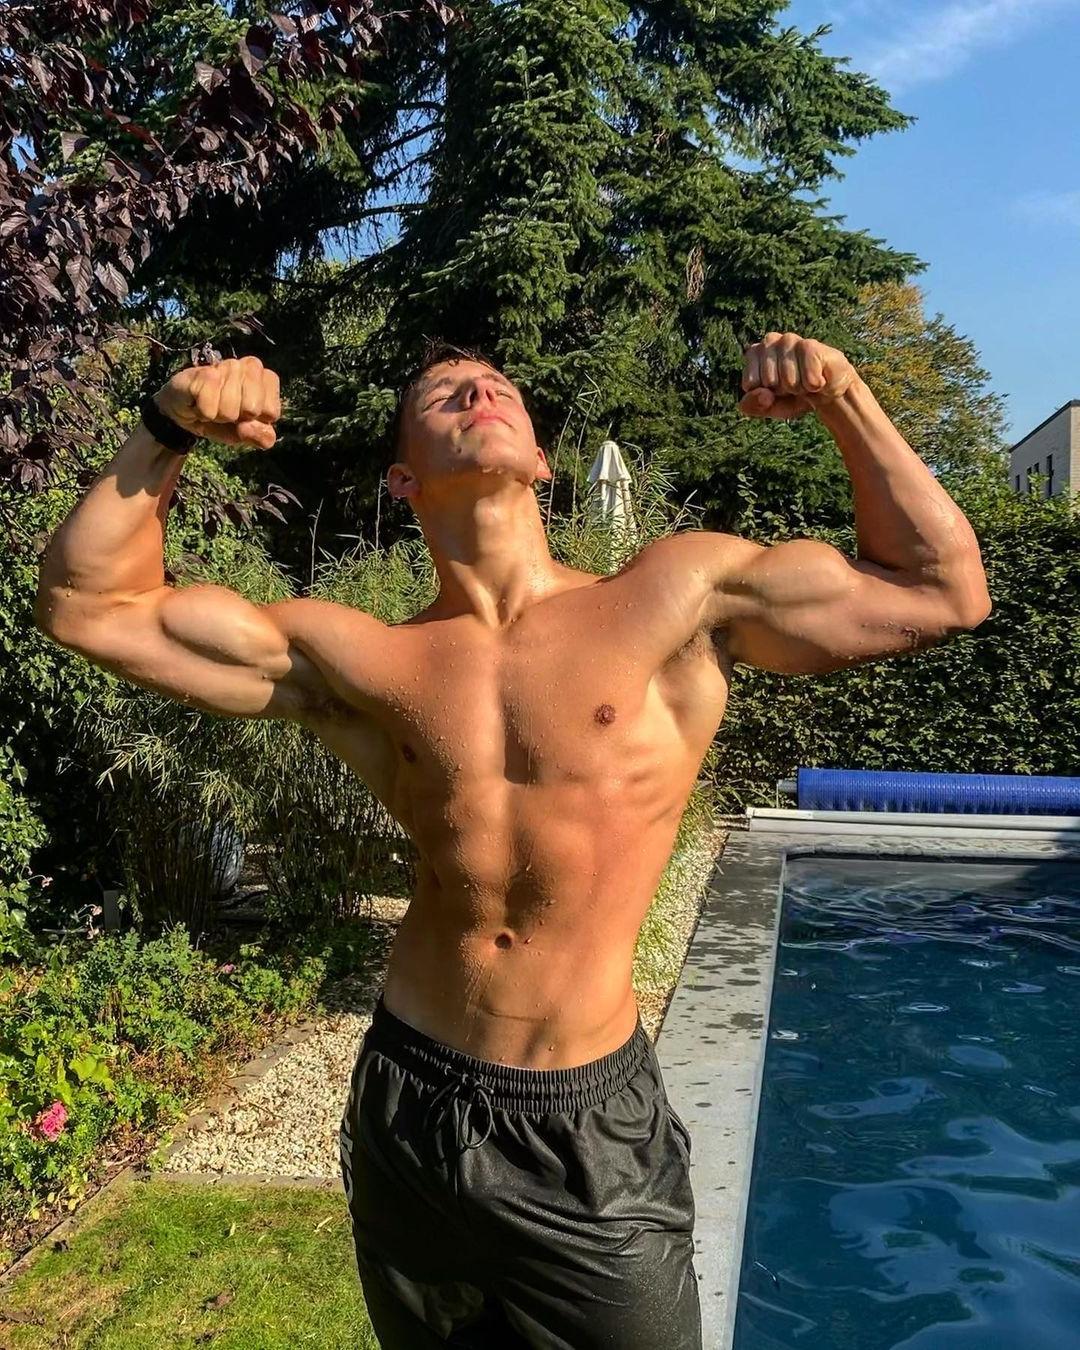 young-wet-shirtless-hunk-huge-biceps-flex-mika-soltau